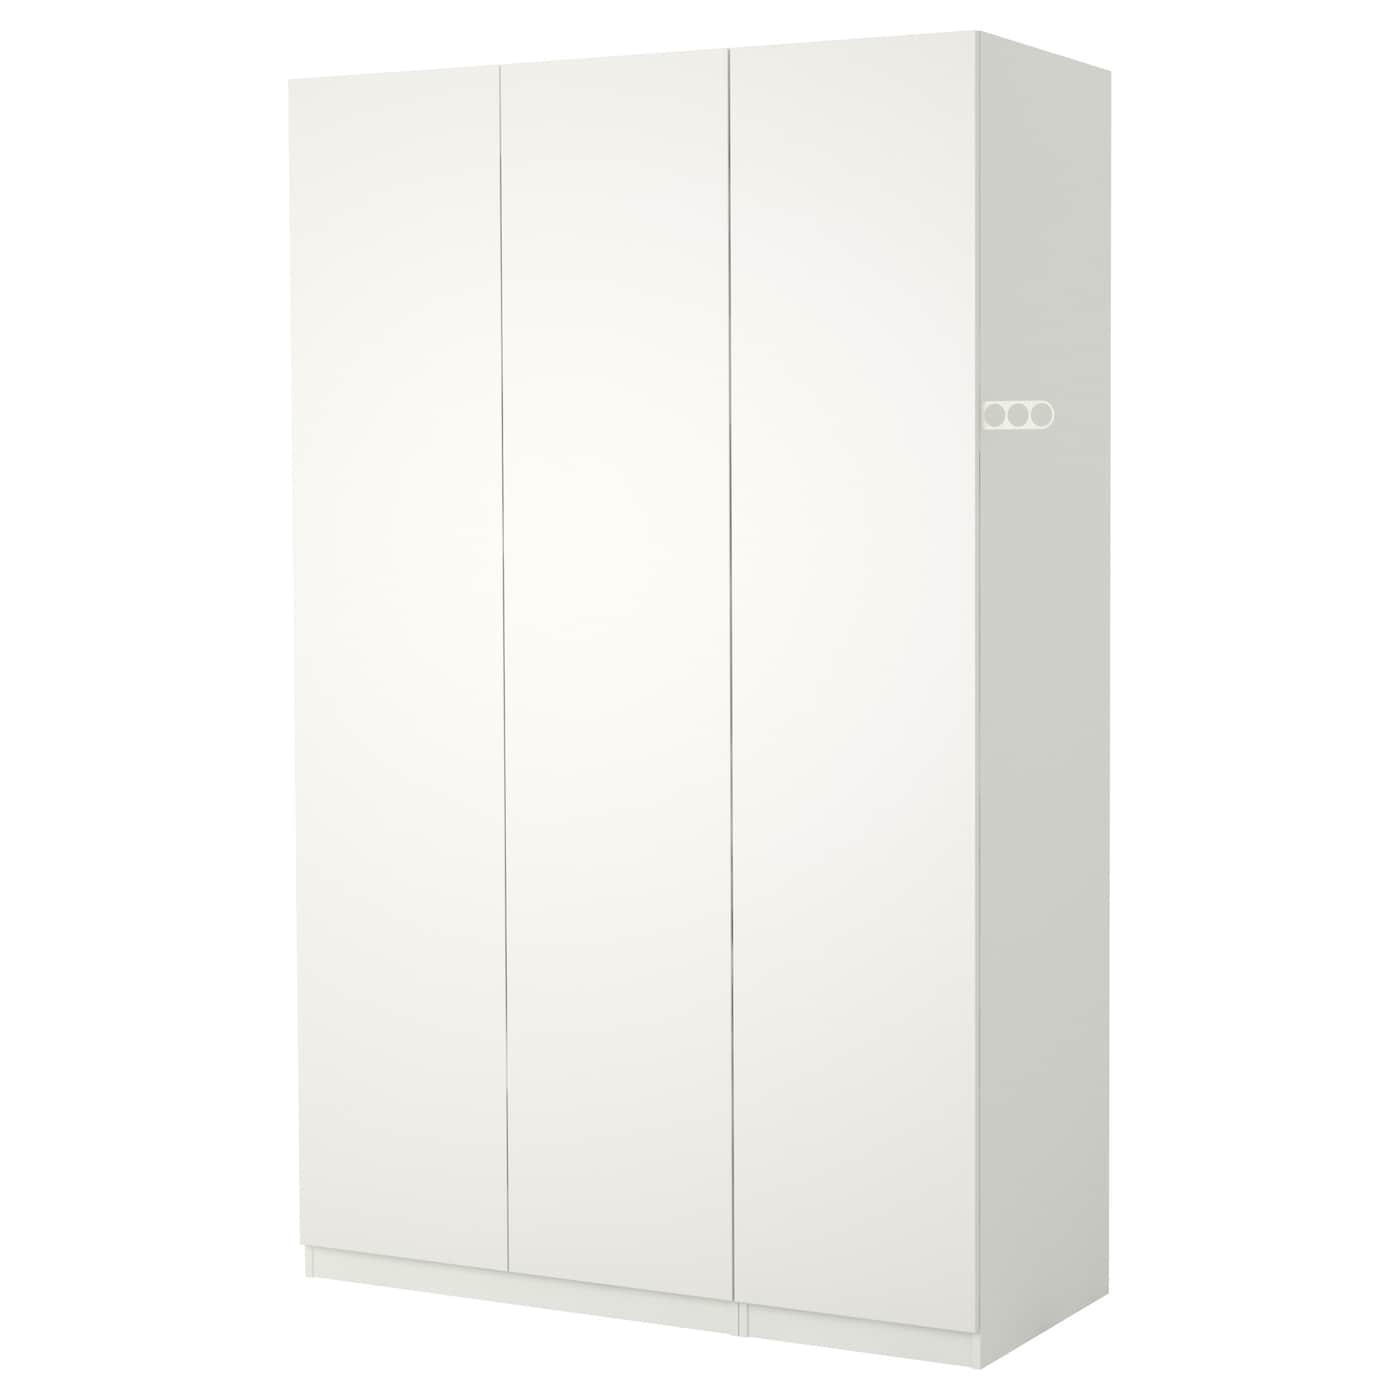 pax wardrobe white tanem white 150x60x201 cm ikea. Black Bedroom Furniture Sets. Home Design Ideas